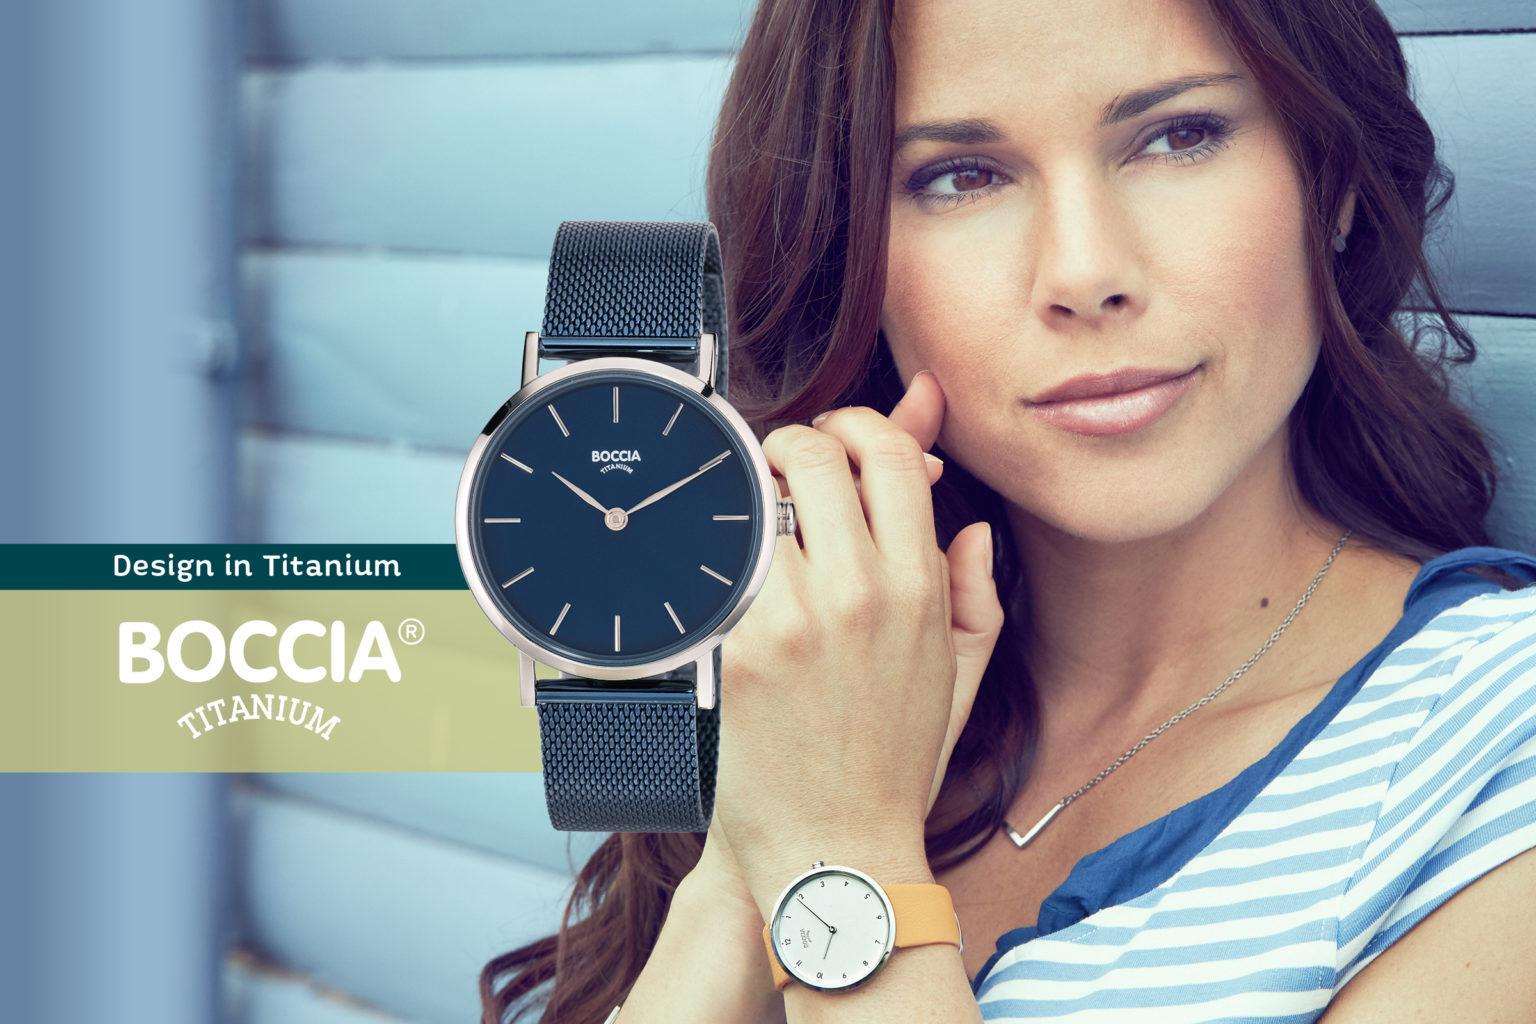 Boccia_Banner_Frau_Modell3281-07____2400 x 1600 px